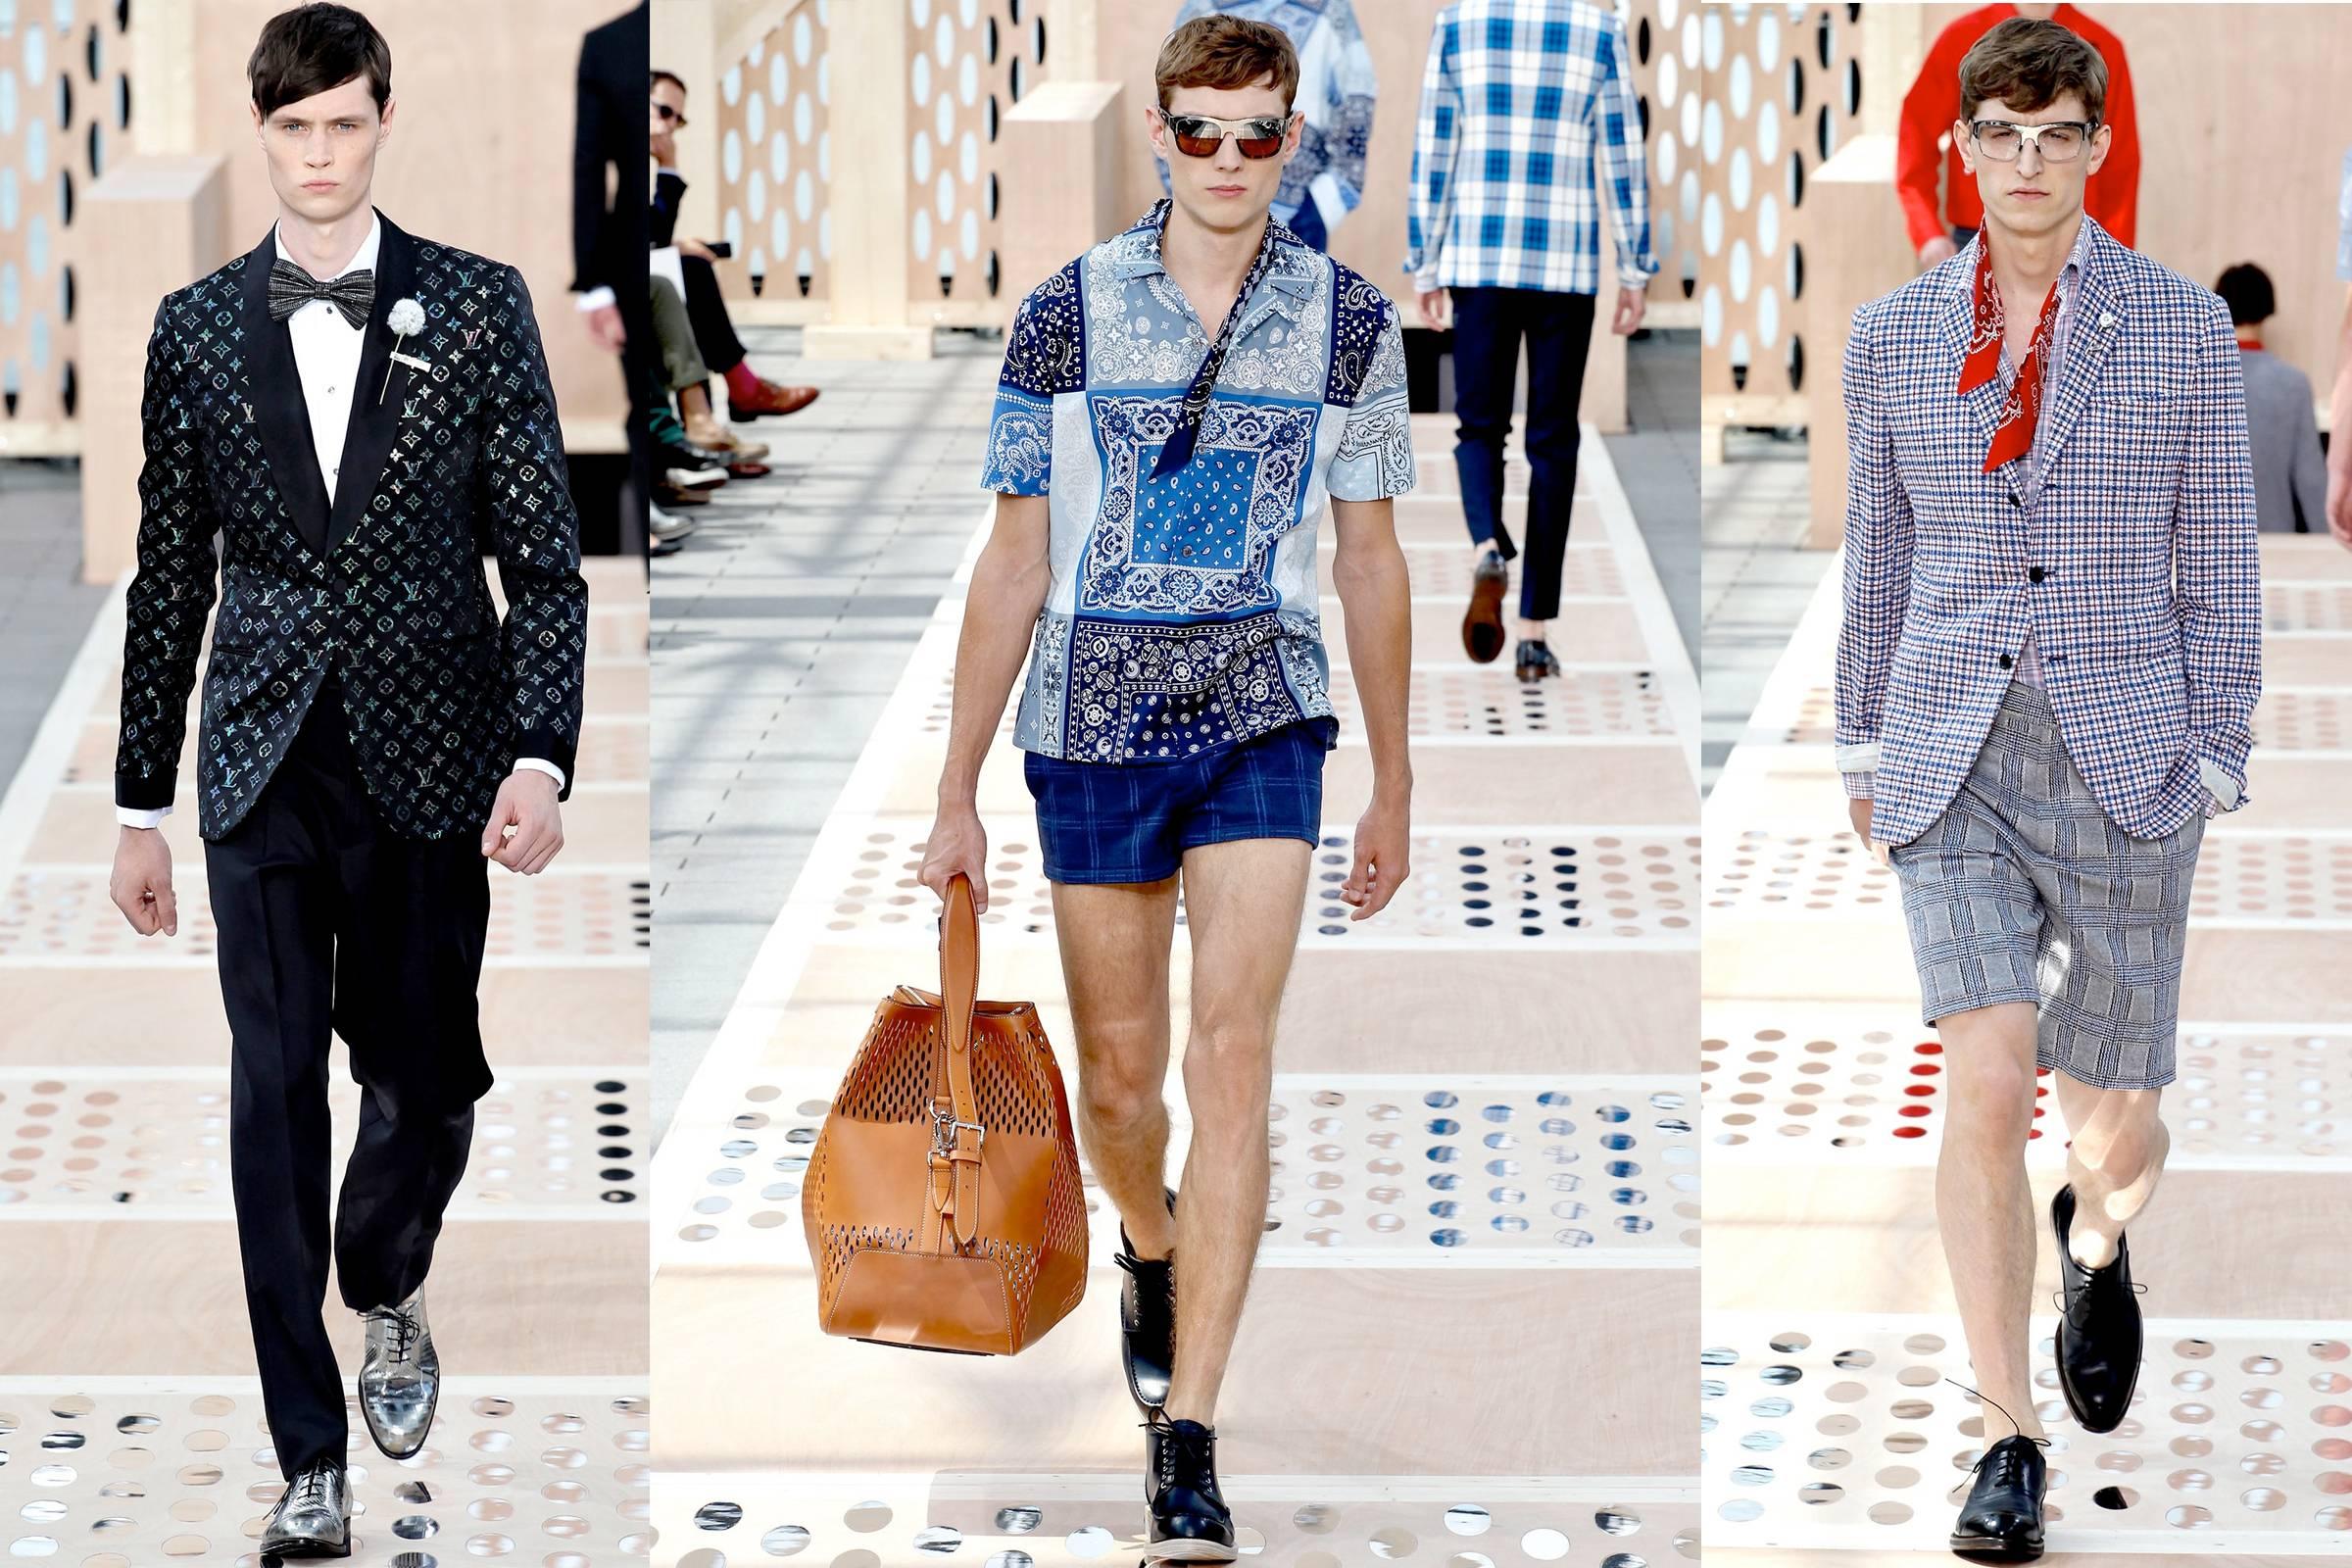 e2c39fefc4f5 Ranking Every Kim Jones Collection for Louis Vuitton - Kim Jones ...